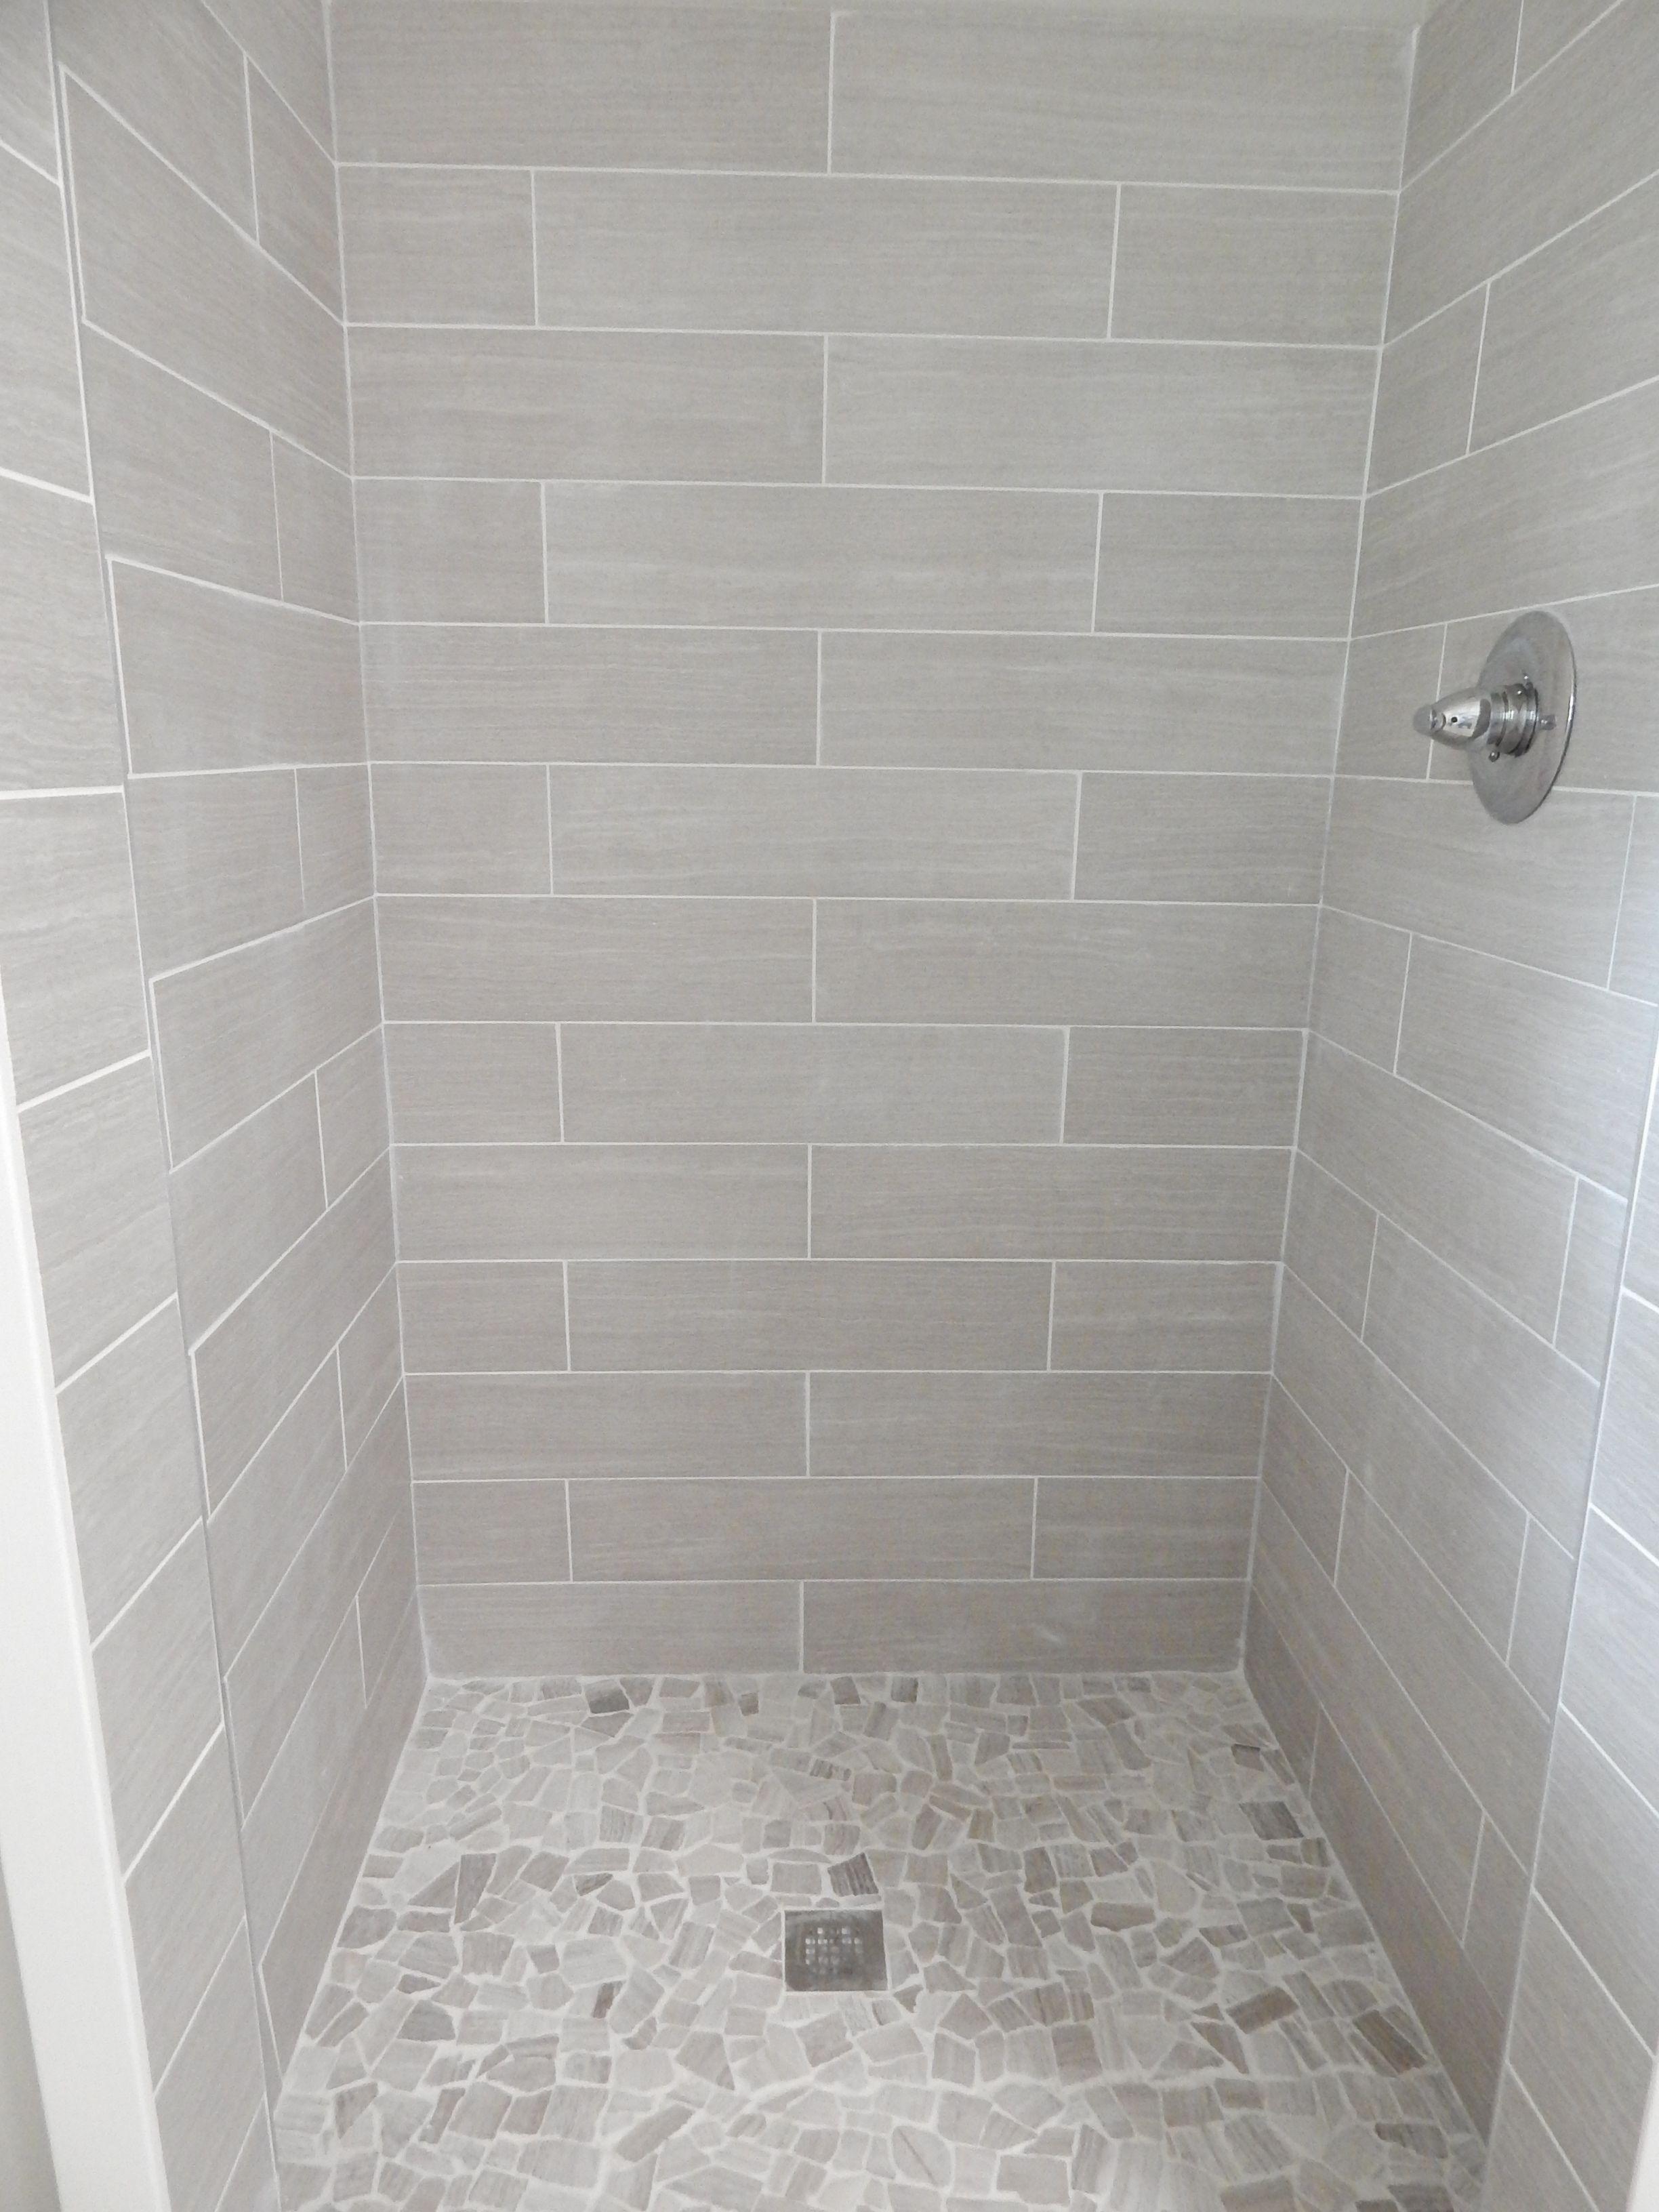 Waterproof Bathroom Wall Panels Home Depot - ACNN DECOR